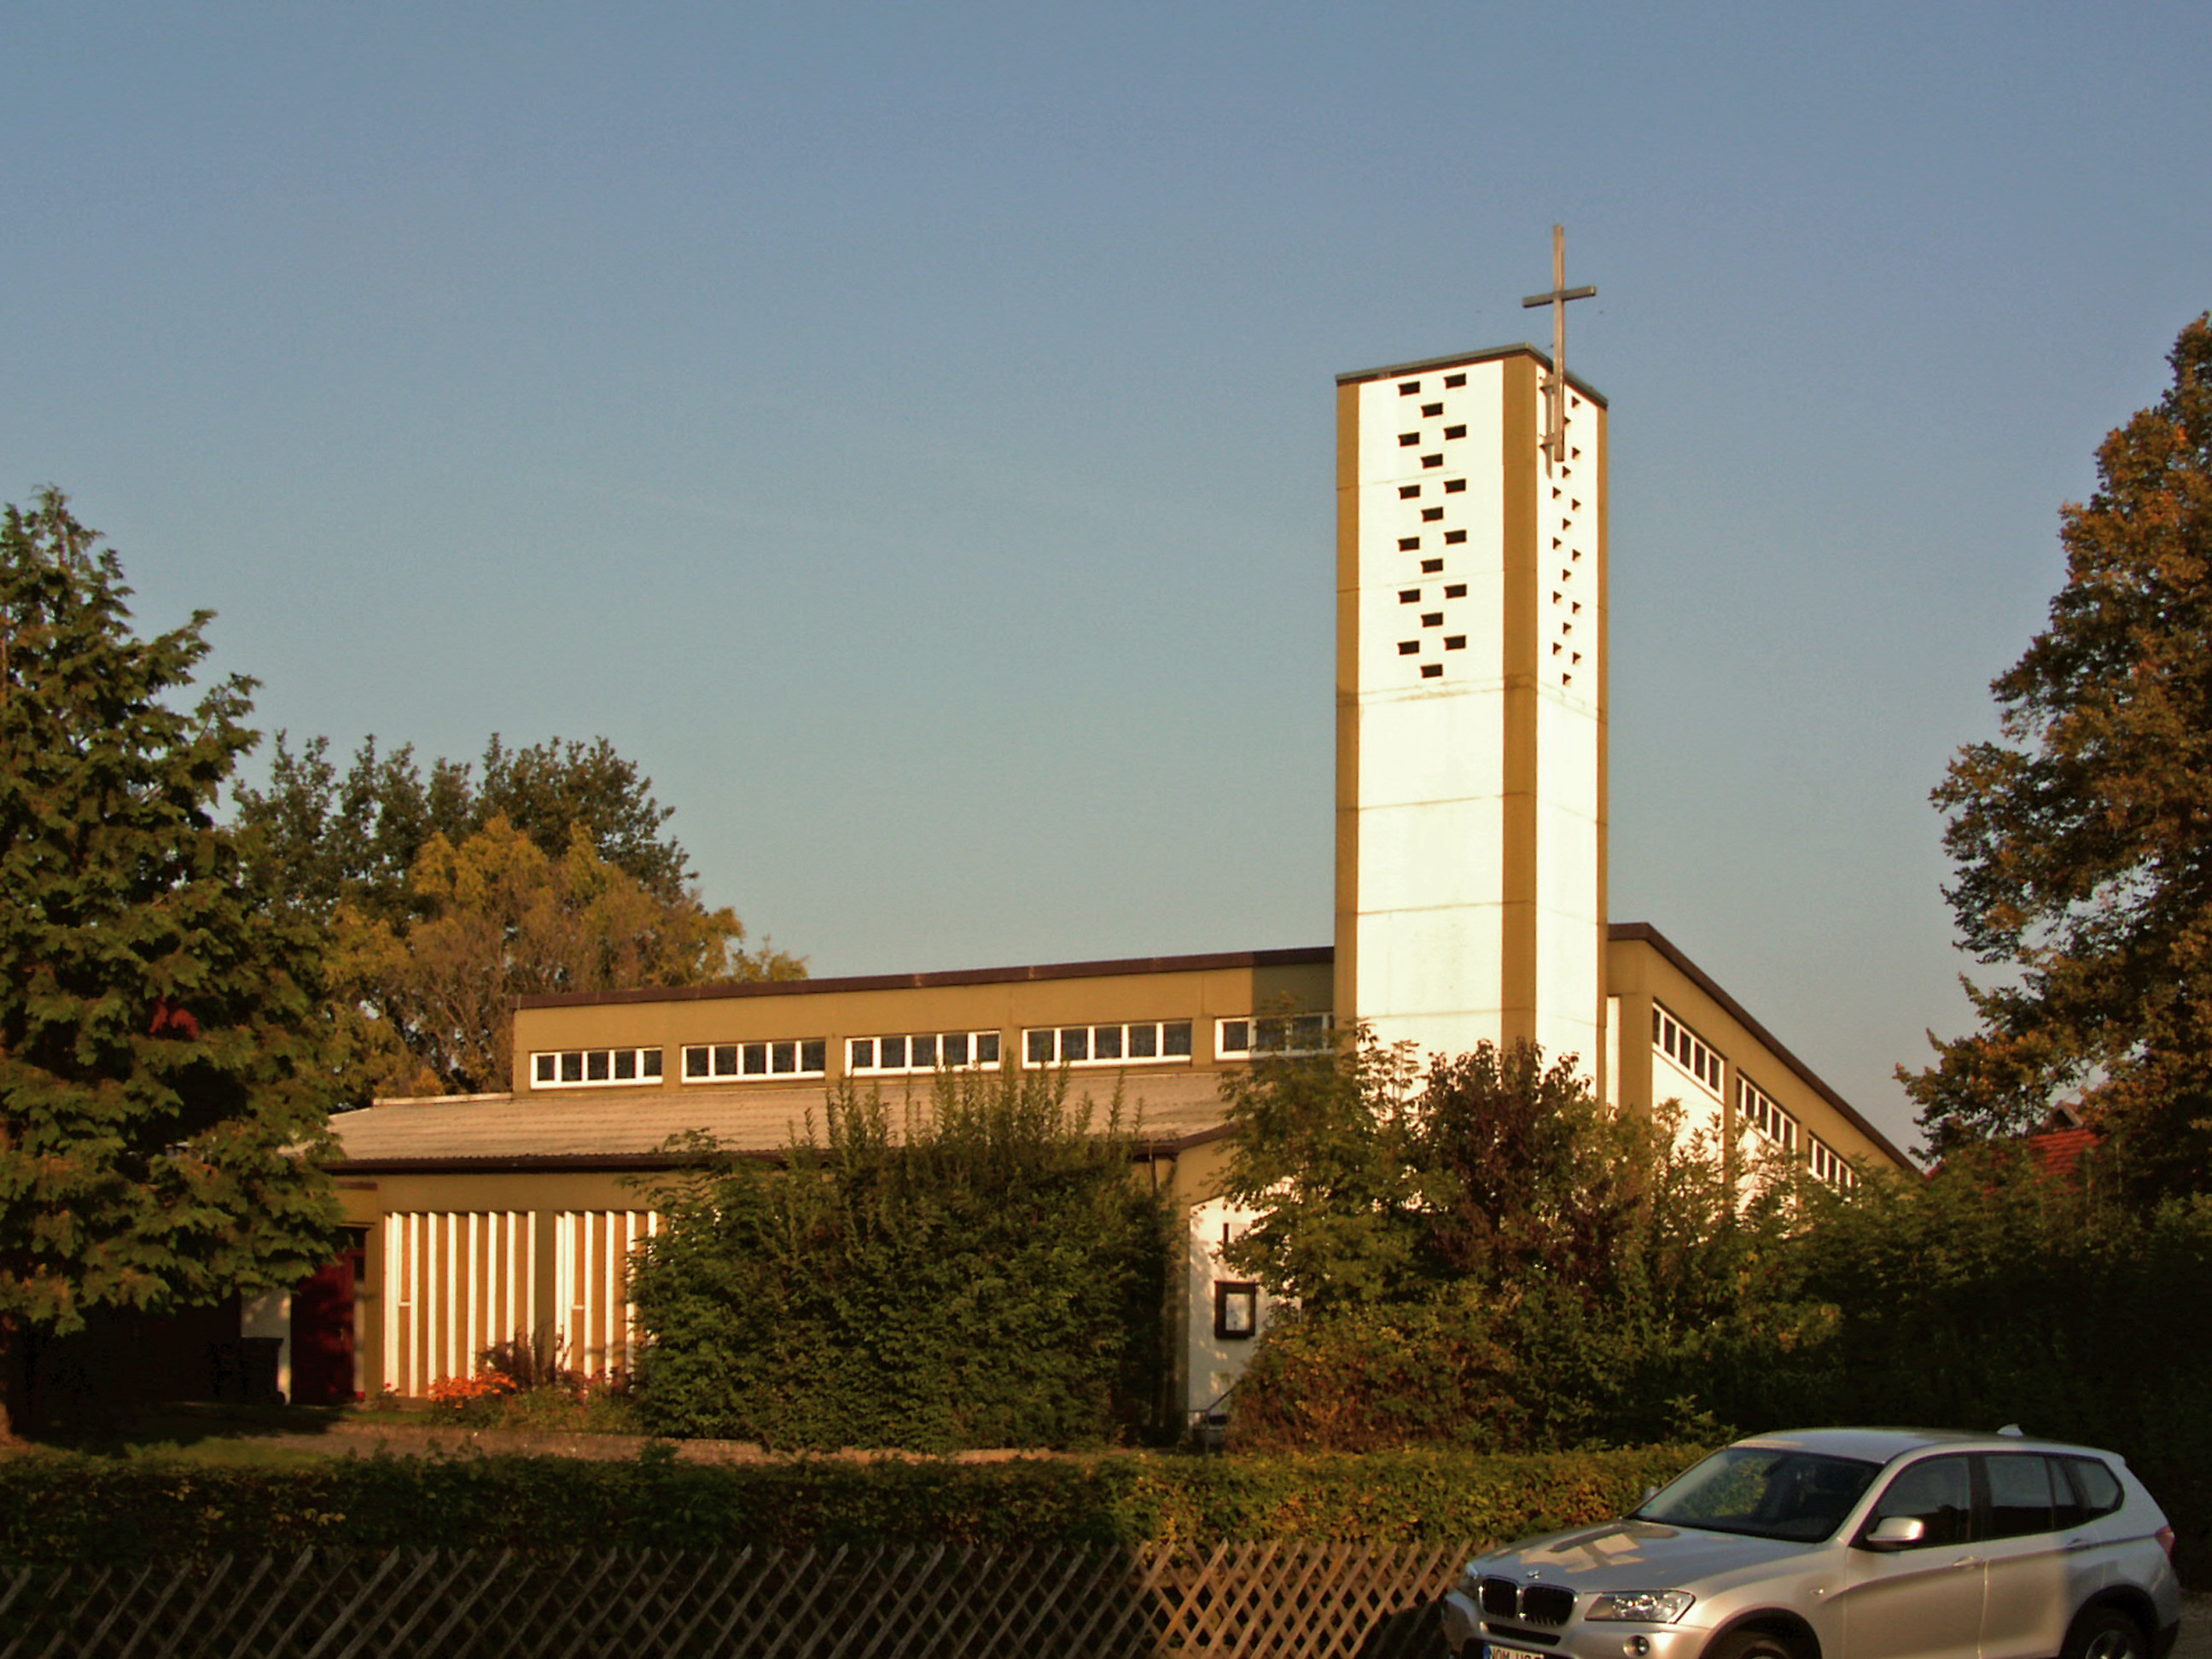 Markoldendorf